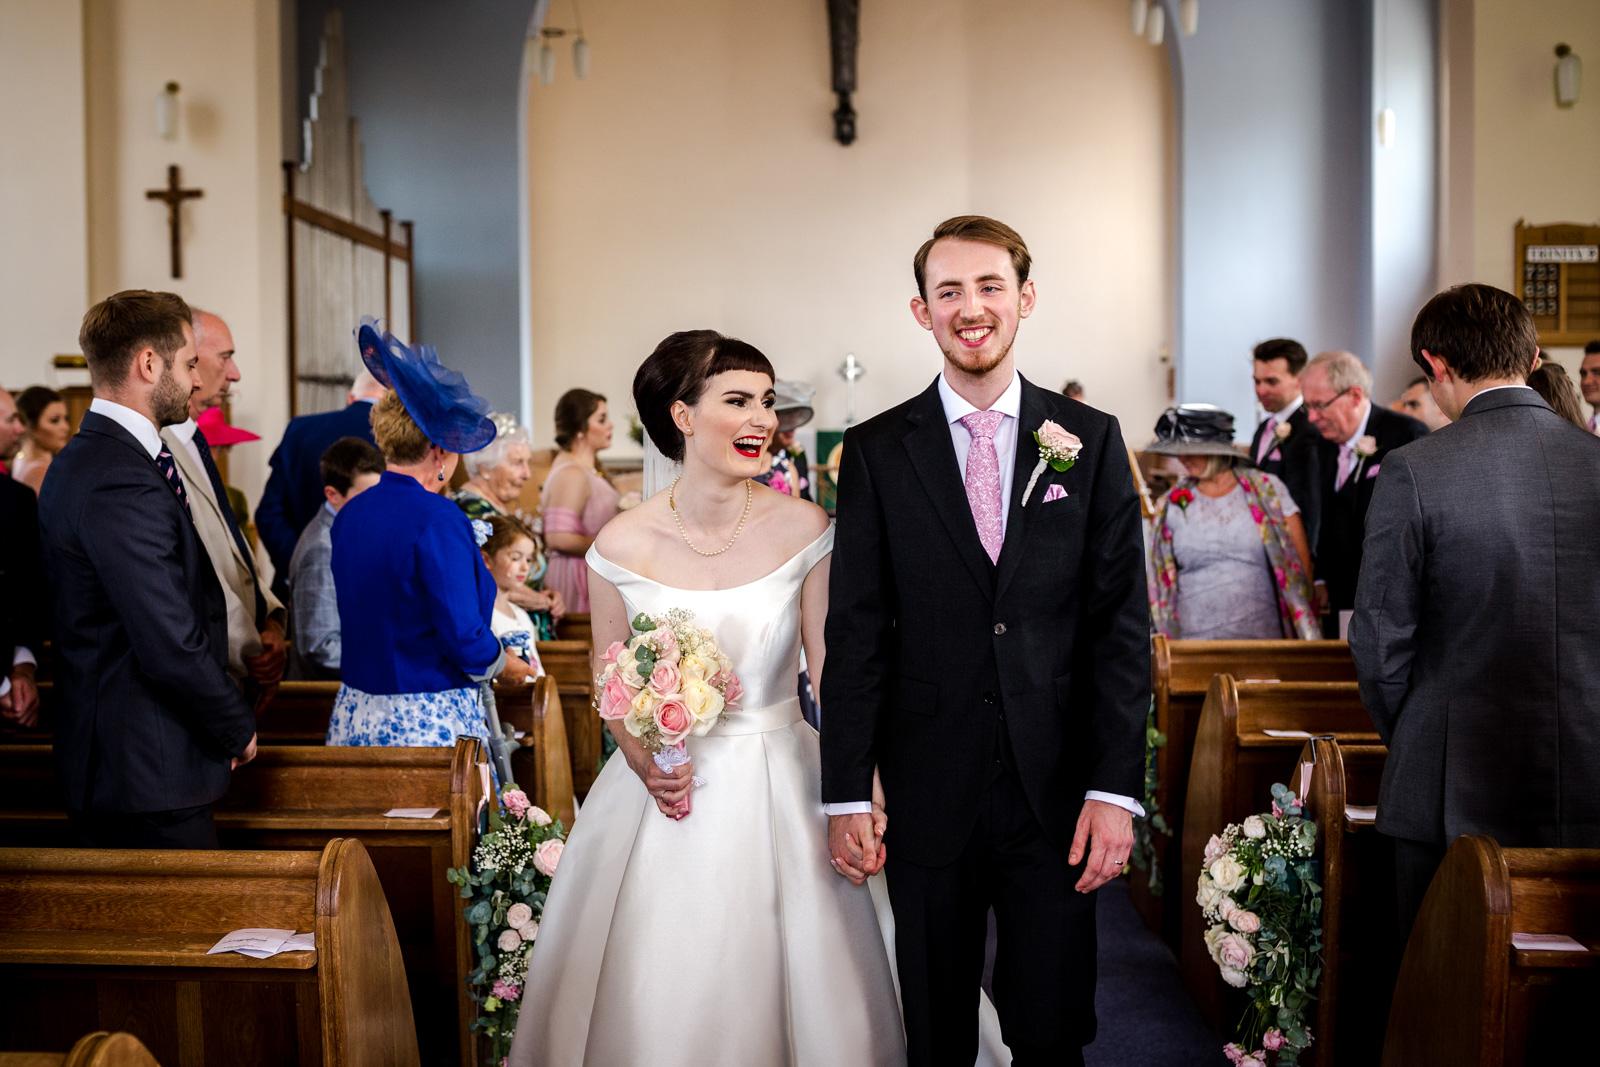 Fisherman's Retreat wedding in Lancashire